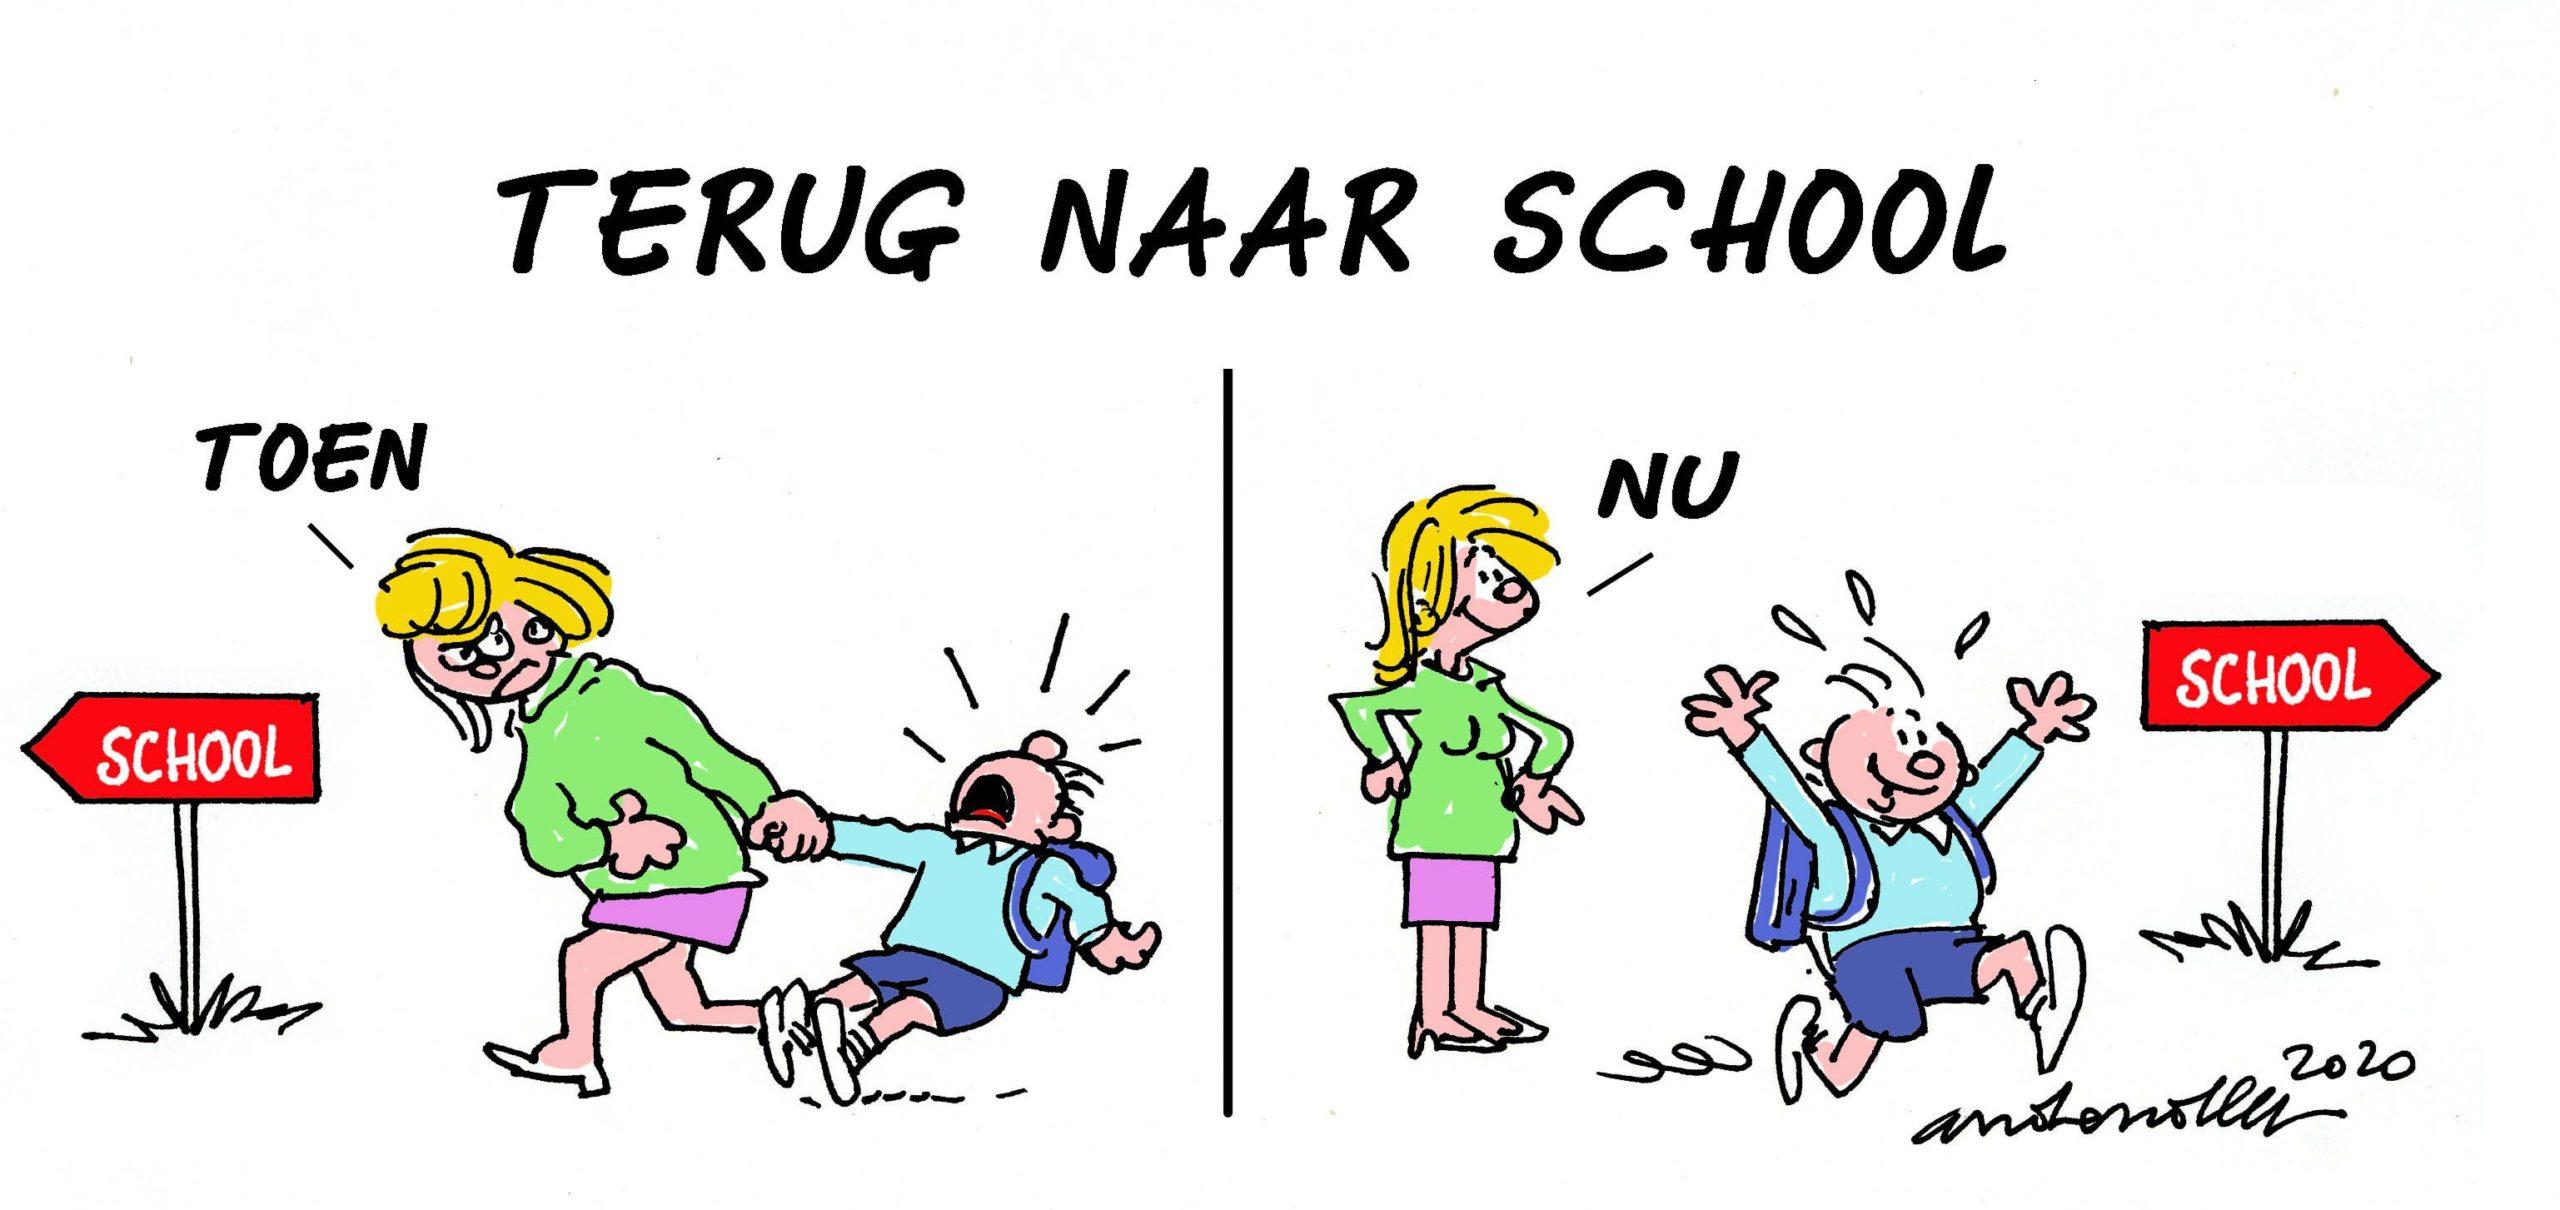 2020nr33school-1